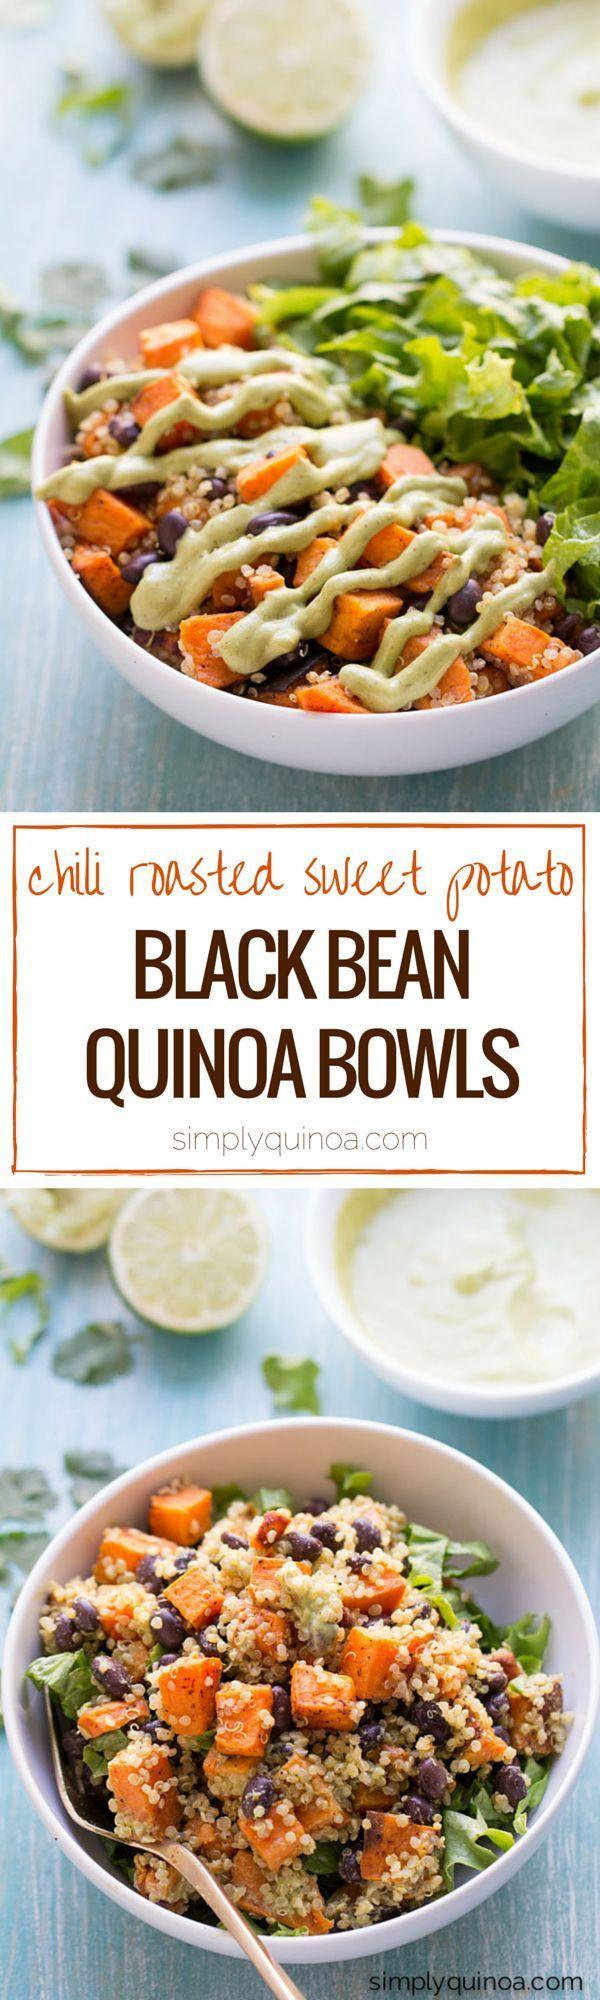 Chili Roasted Sweet Potato + Black Bean Quinoa Salad with a creamy Cilantro-Avocado Dressing [vegan + gluten-free]